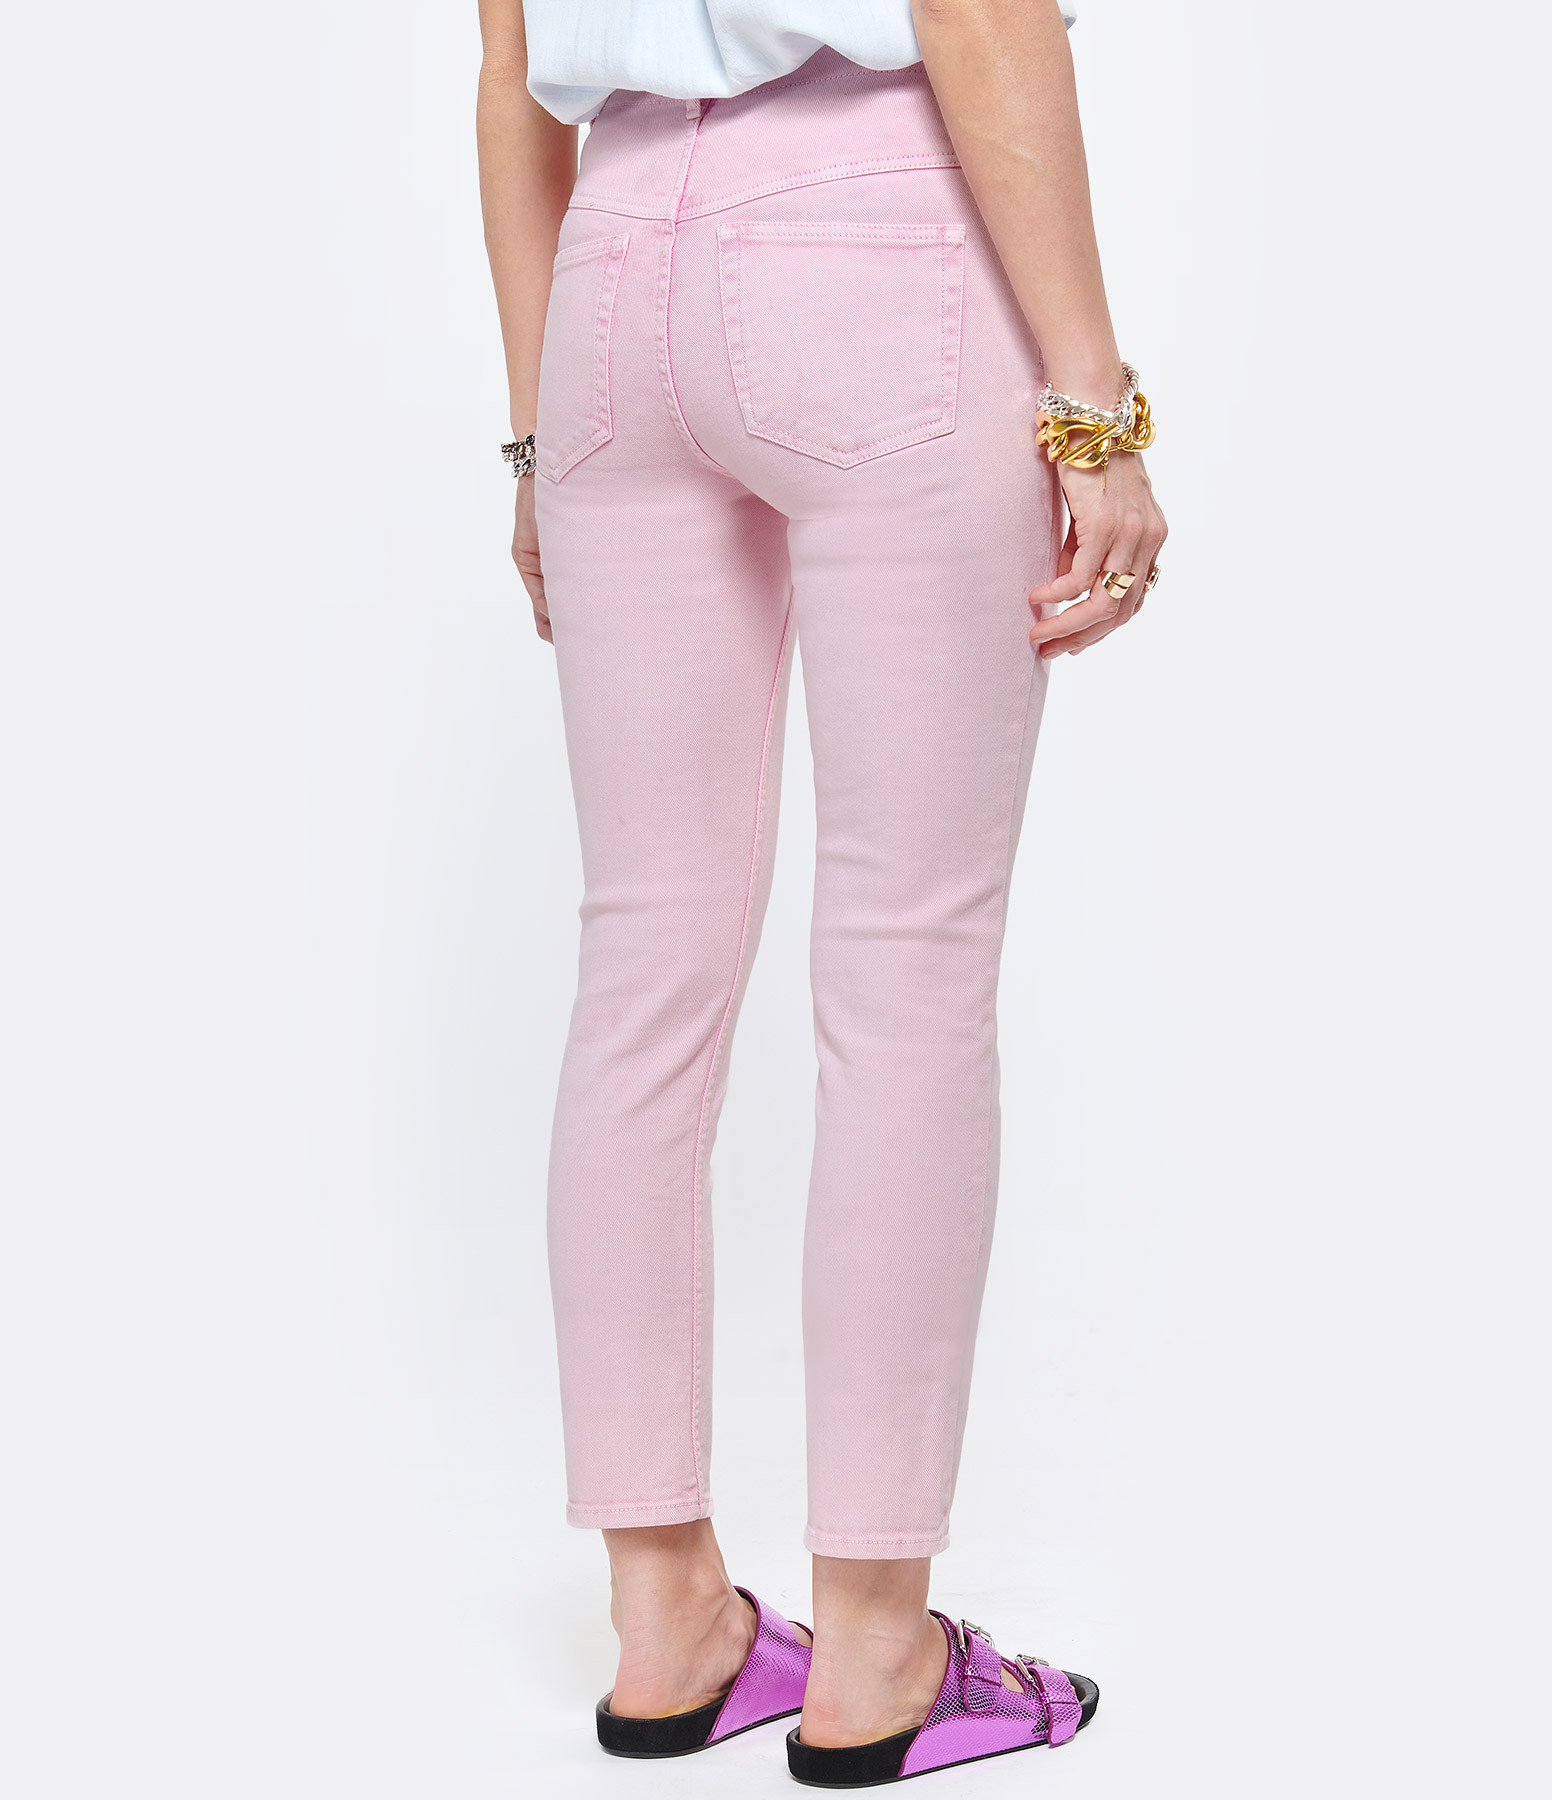 ISABEL MARANT - Pantalon Dilianesr Coton Rose Clair